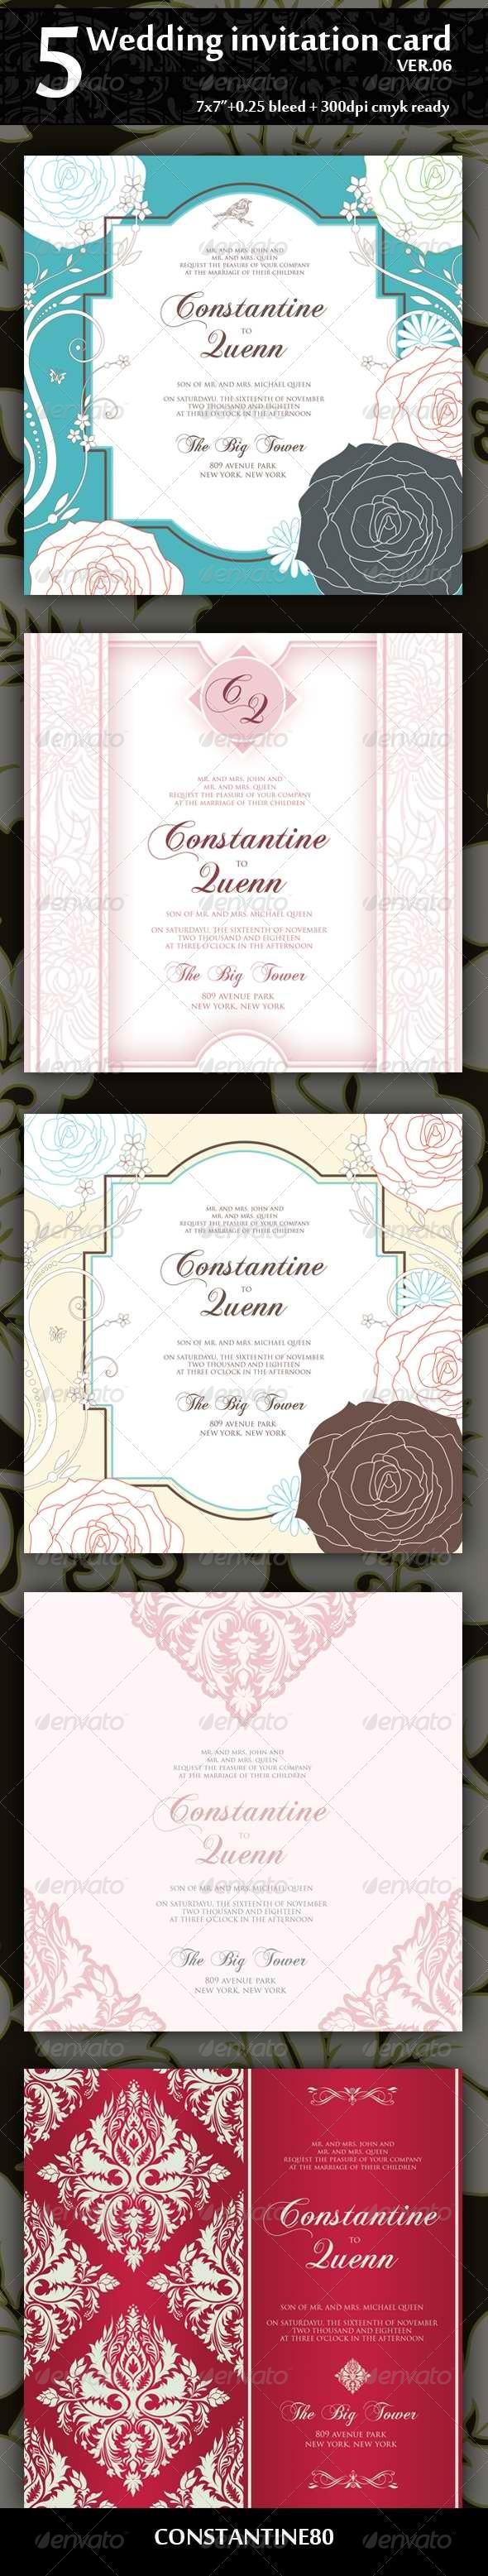 5 Wedding Invitation Card Ver06 - Weddings Cards & Invites